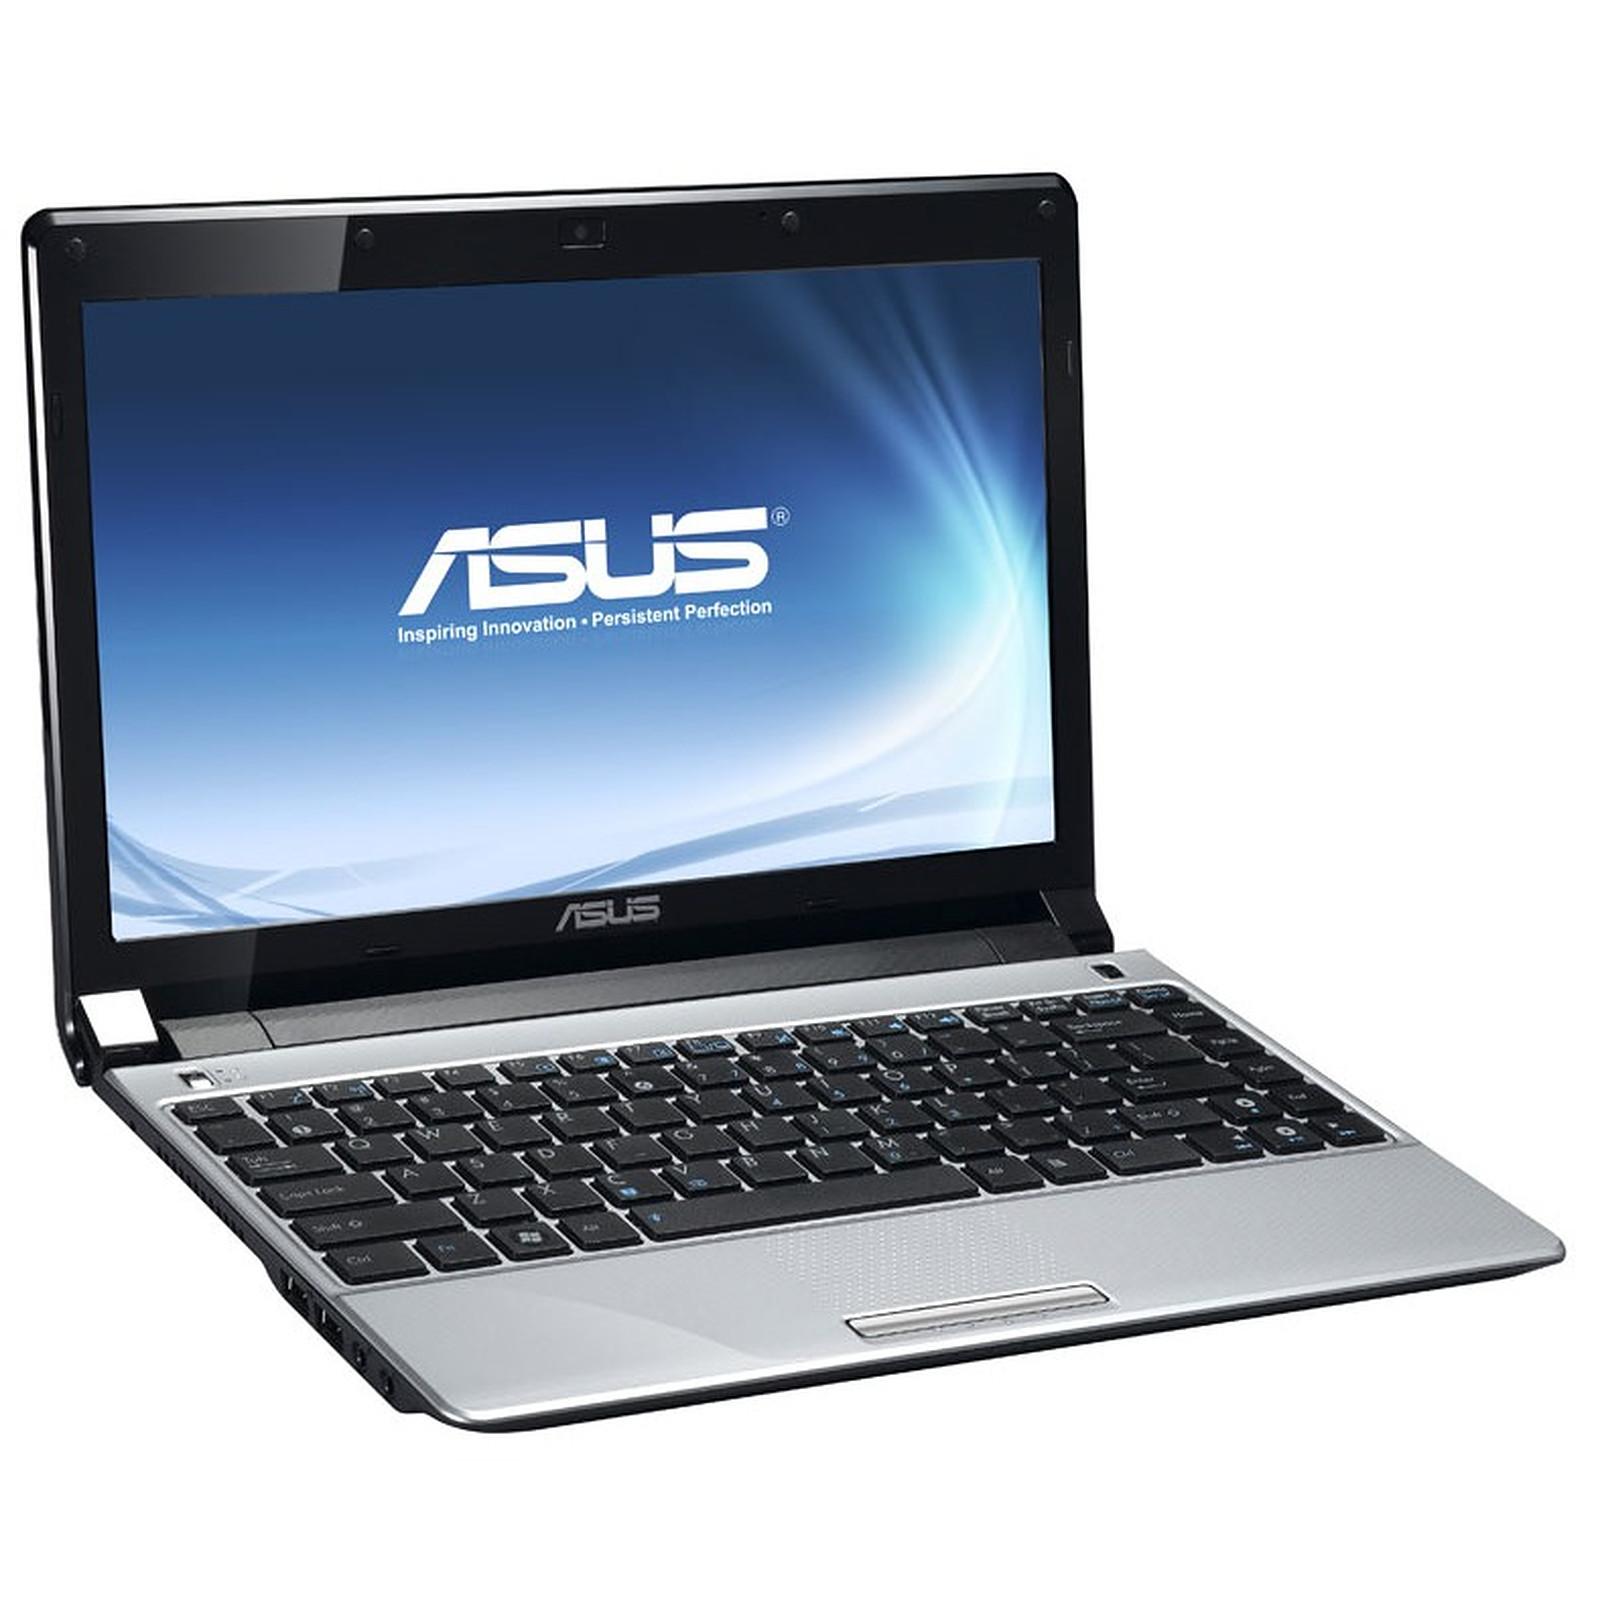 ASUS UL20A-2X027X